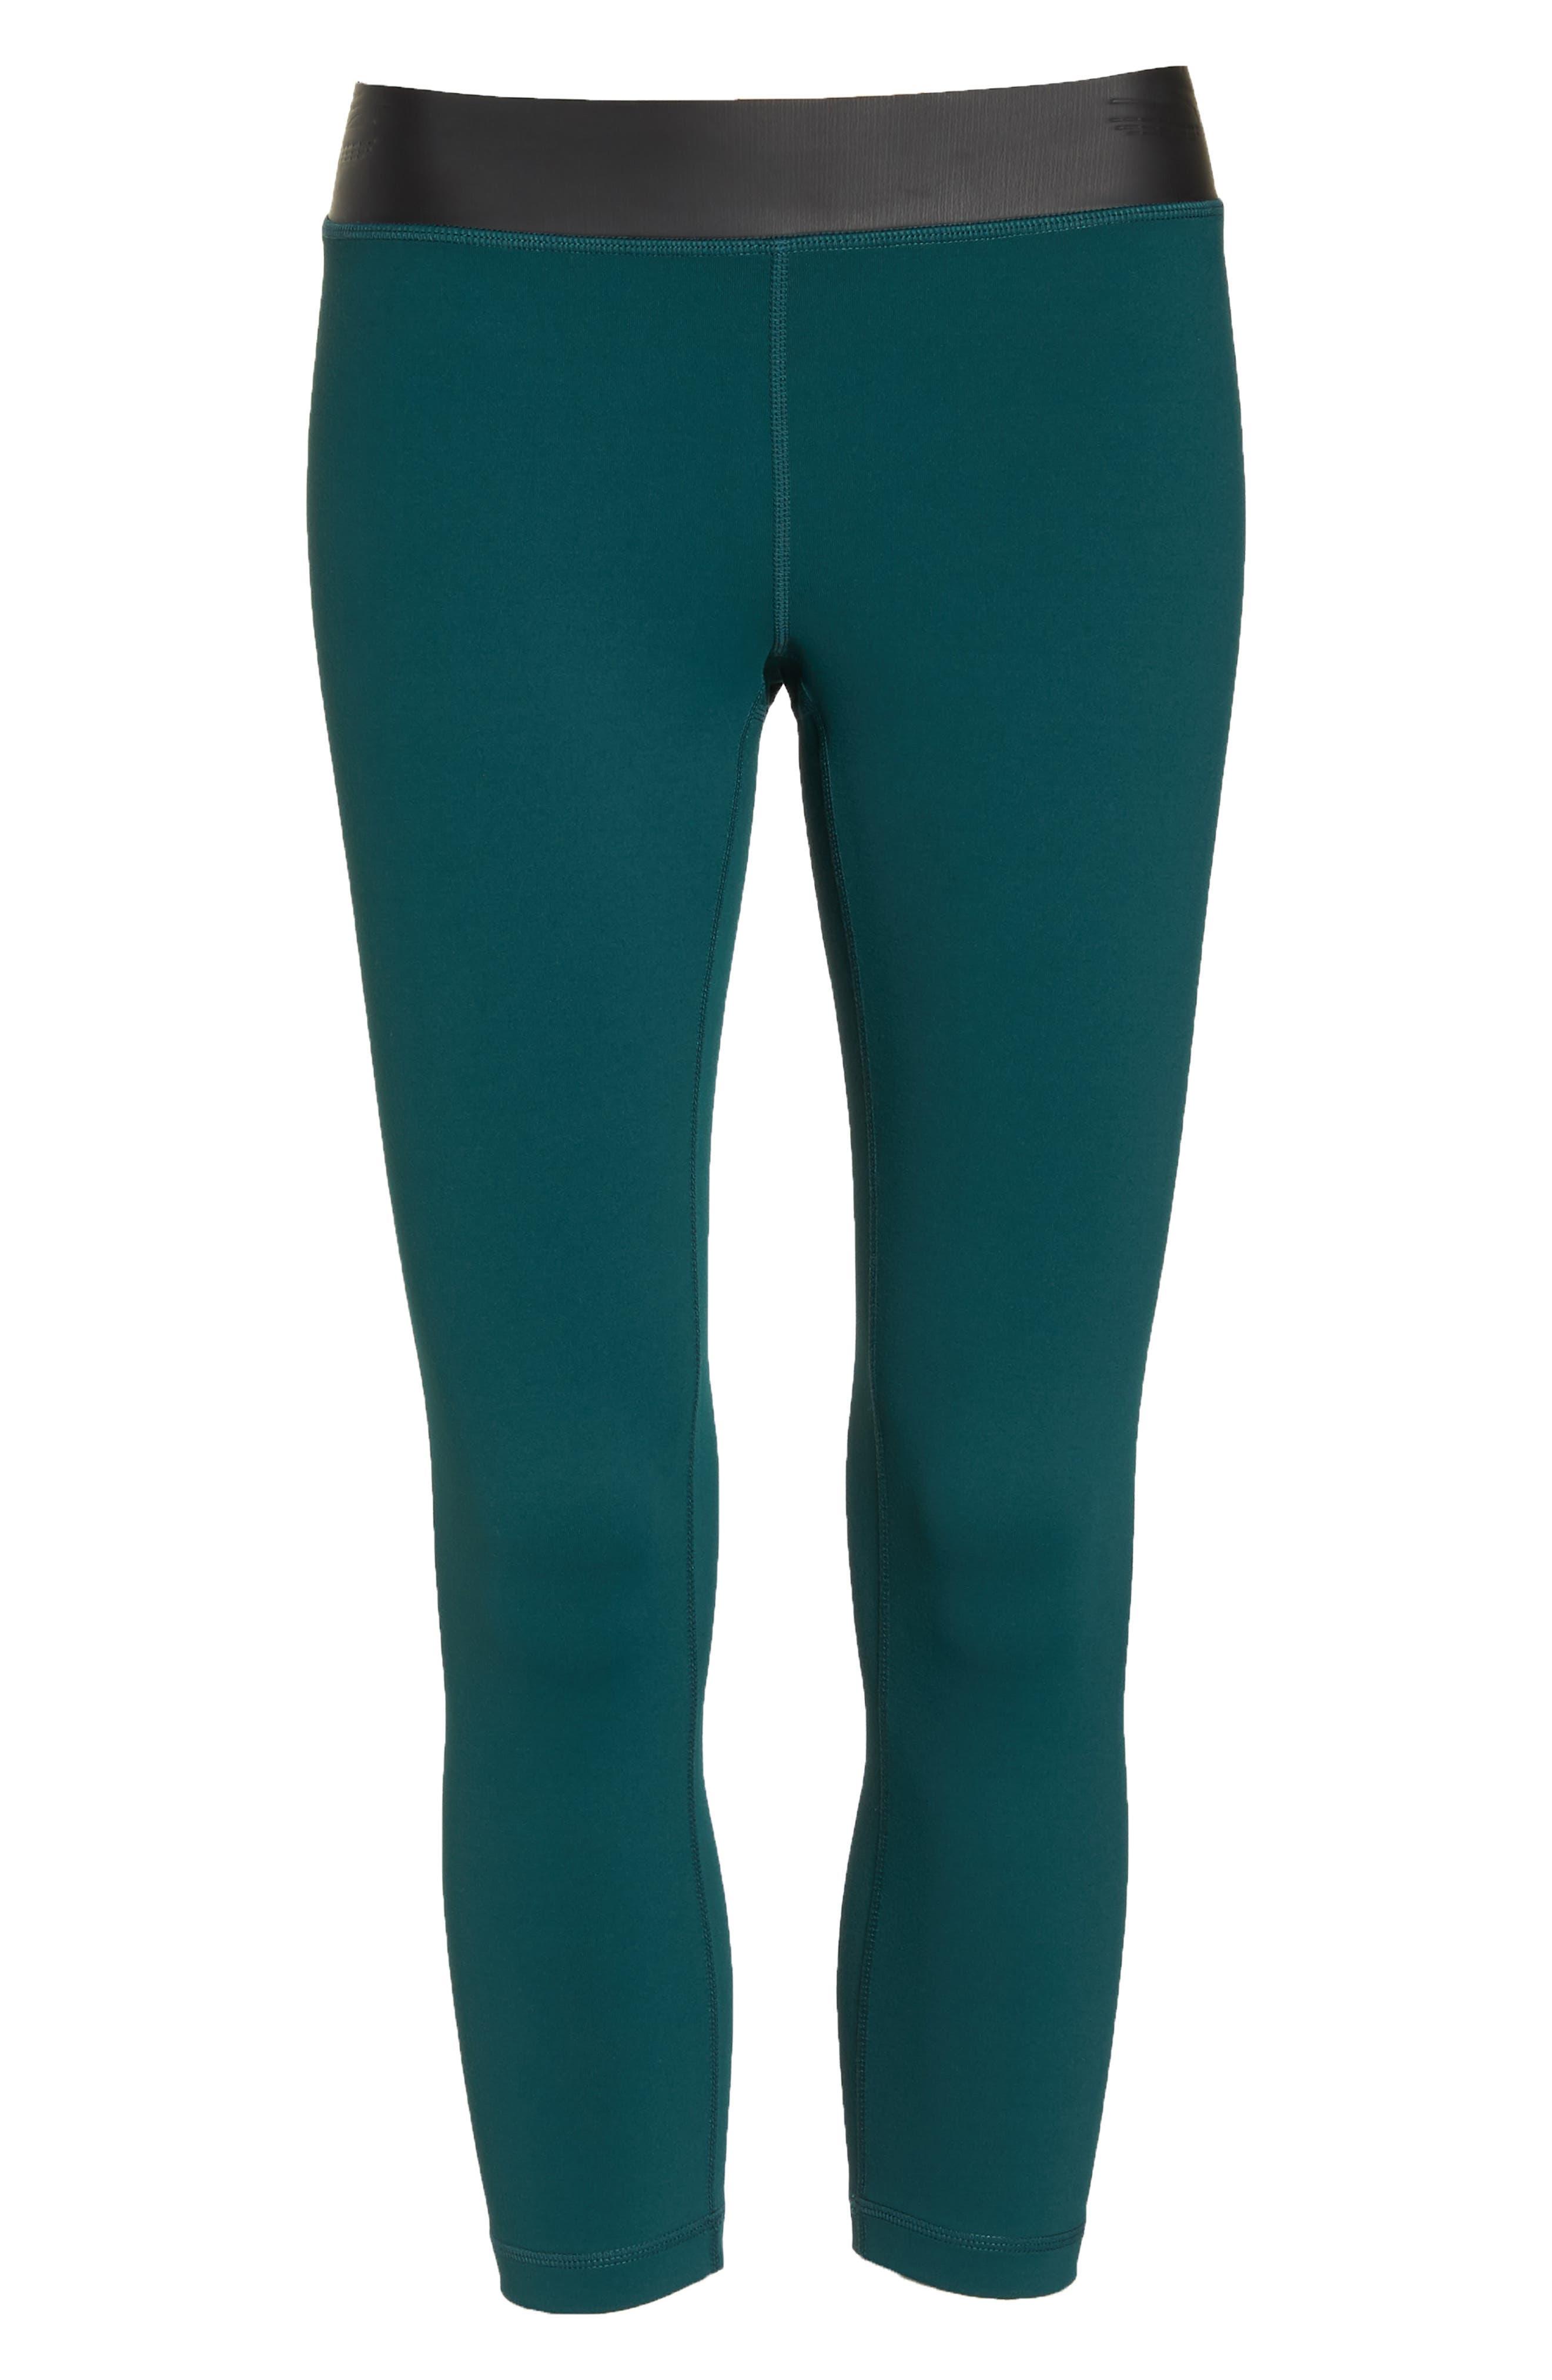 Neo Banded Crop Leggings,                             Alternate thumbnail 7, color,                             Green Bug